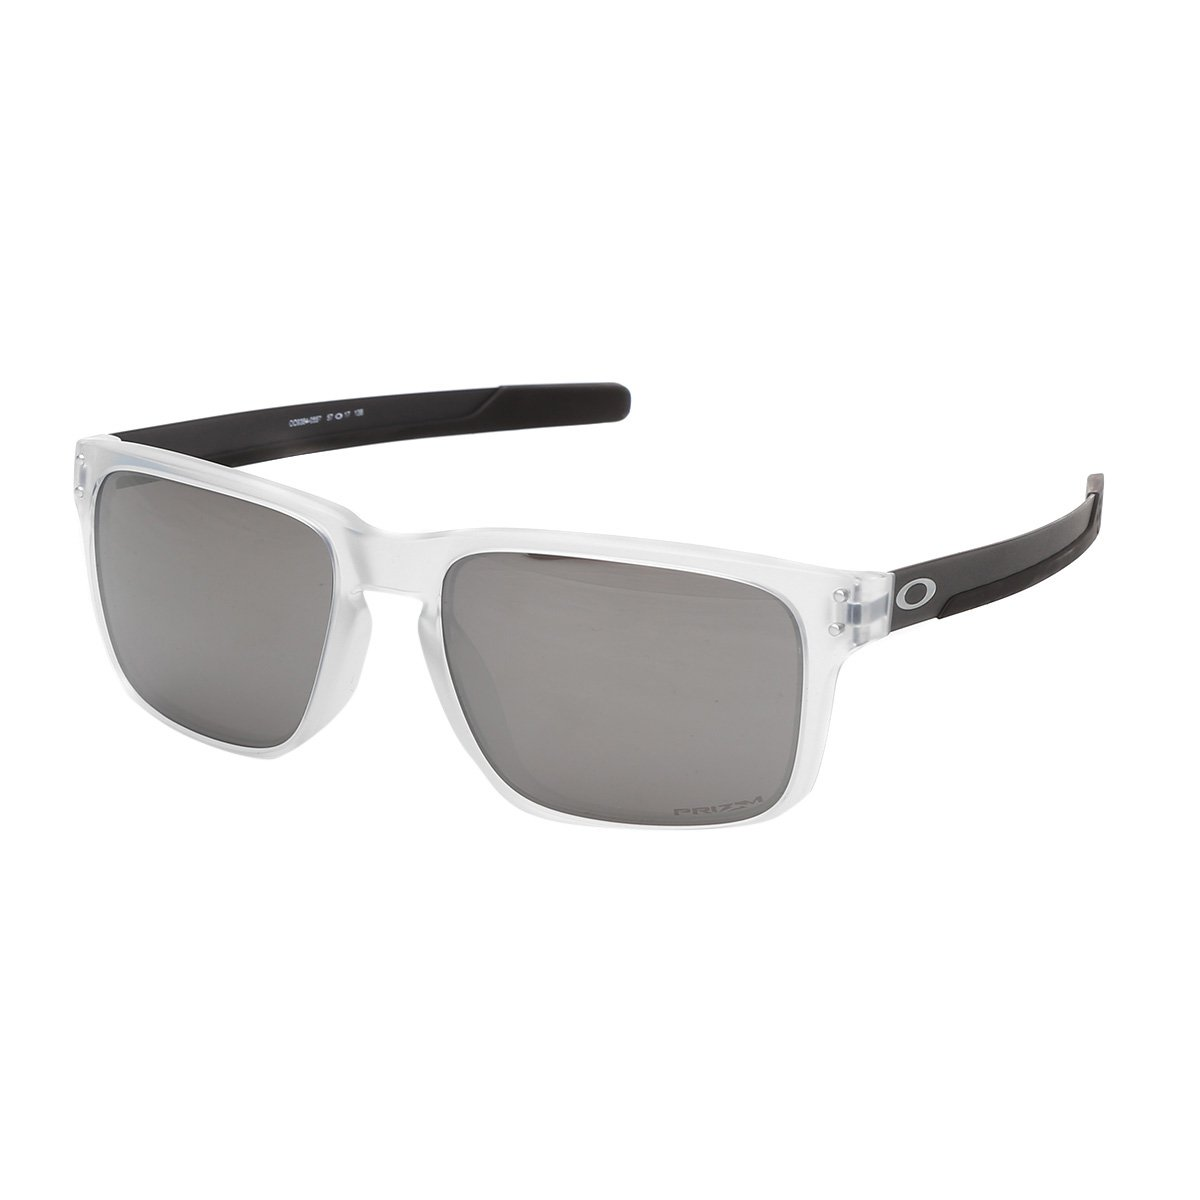 80d6ff547 Óculos Oakley Holbrook Mix Matte Clear Prizm OO9384 Masculino - ...